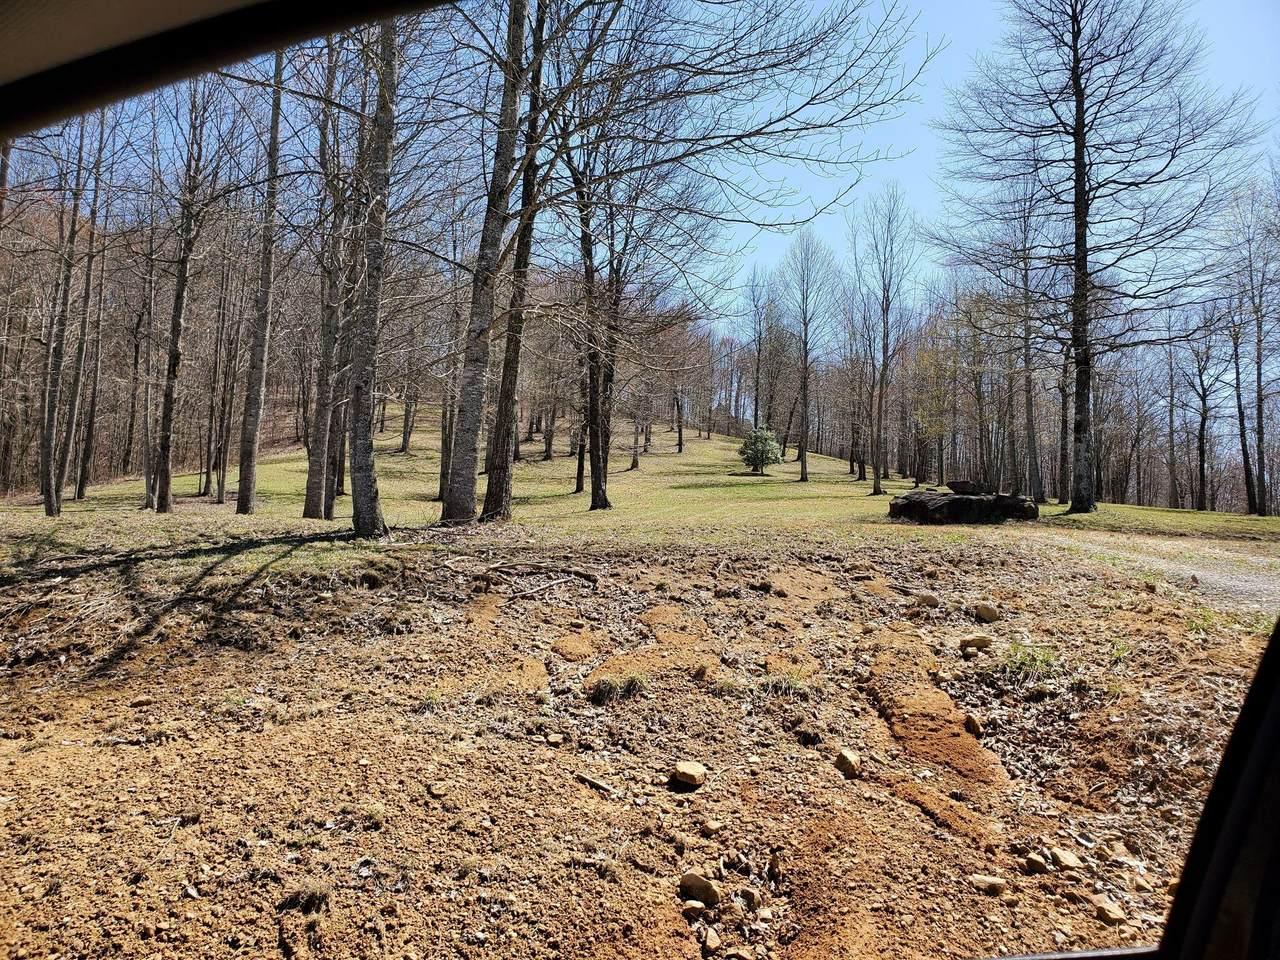 243 Roaring Creek Rd. Lot #243 - Photo 1